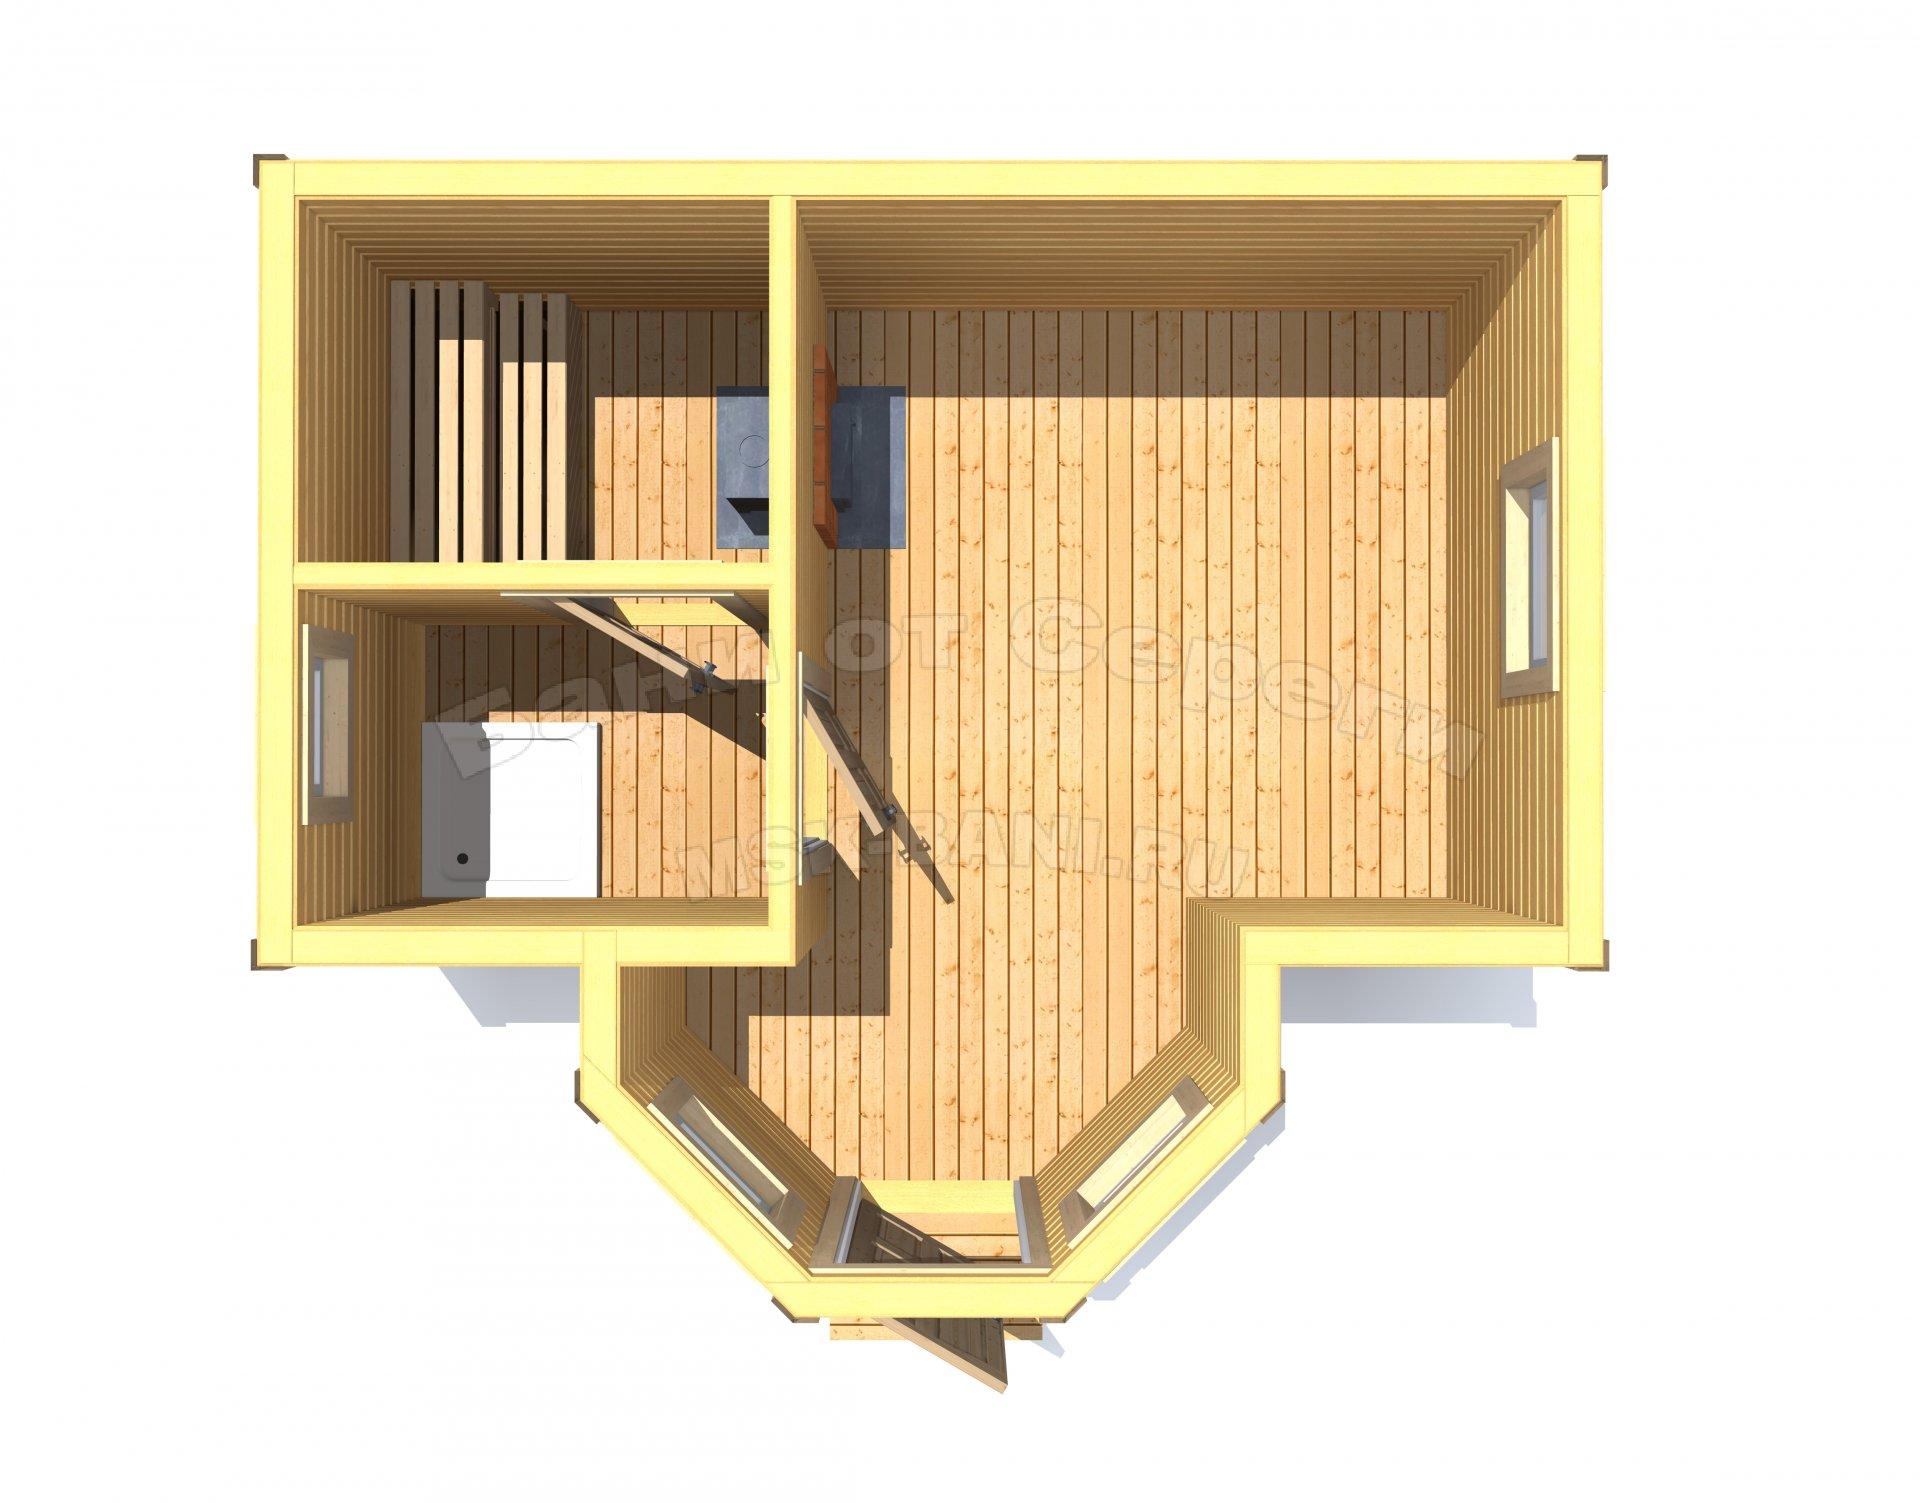 Баня 3 на 4 проекты с размерами, схема и чертежи, планировка из бревна внутри